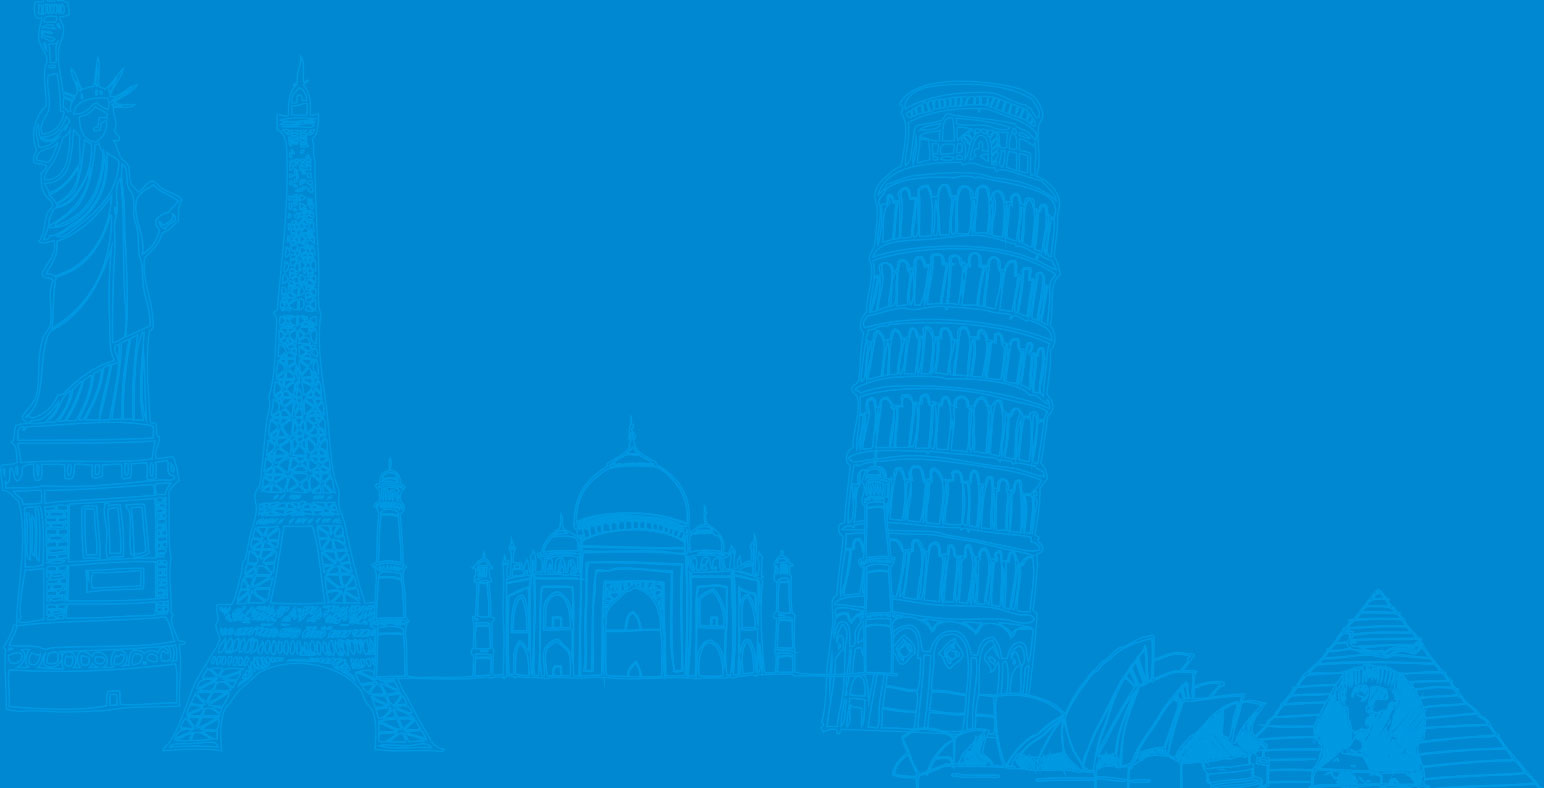 WHY SKYLINE HOLIDAYS? - Skyline Holidays - Best Travel Agency in Surat, India